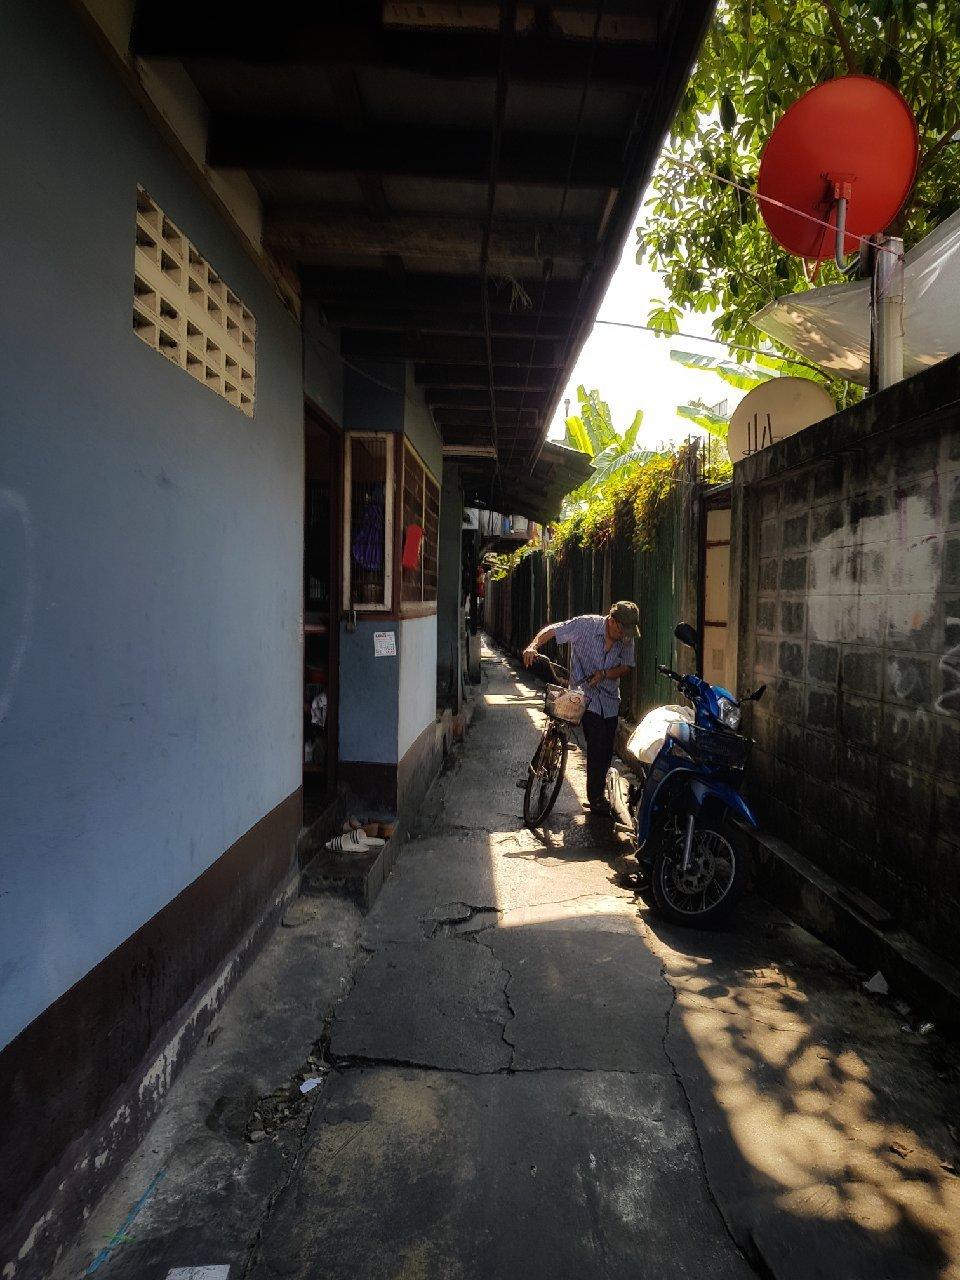 A Sinuous Path Through the Slum